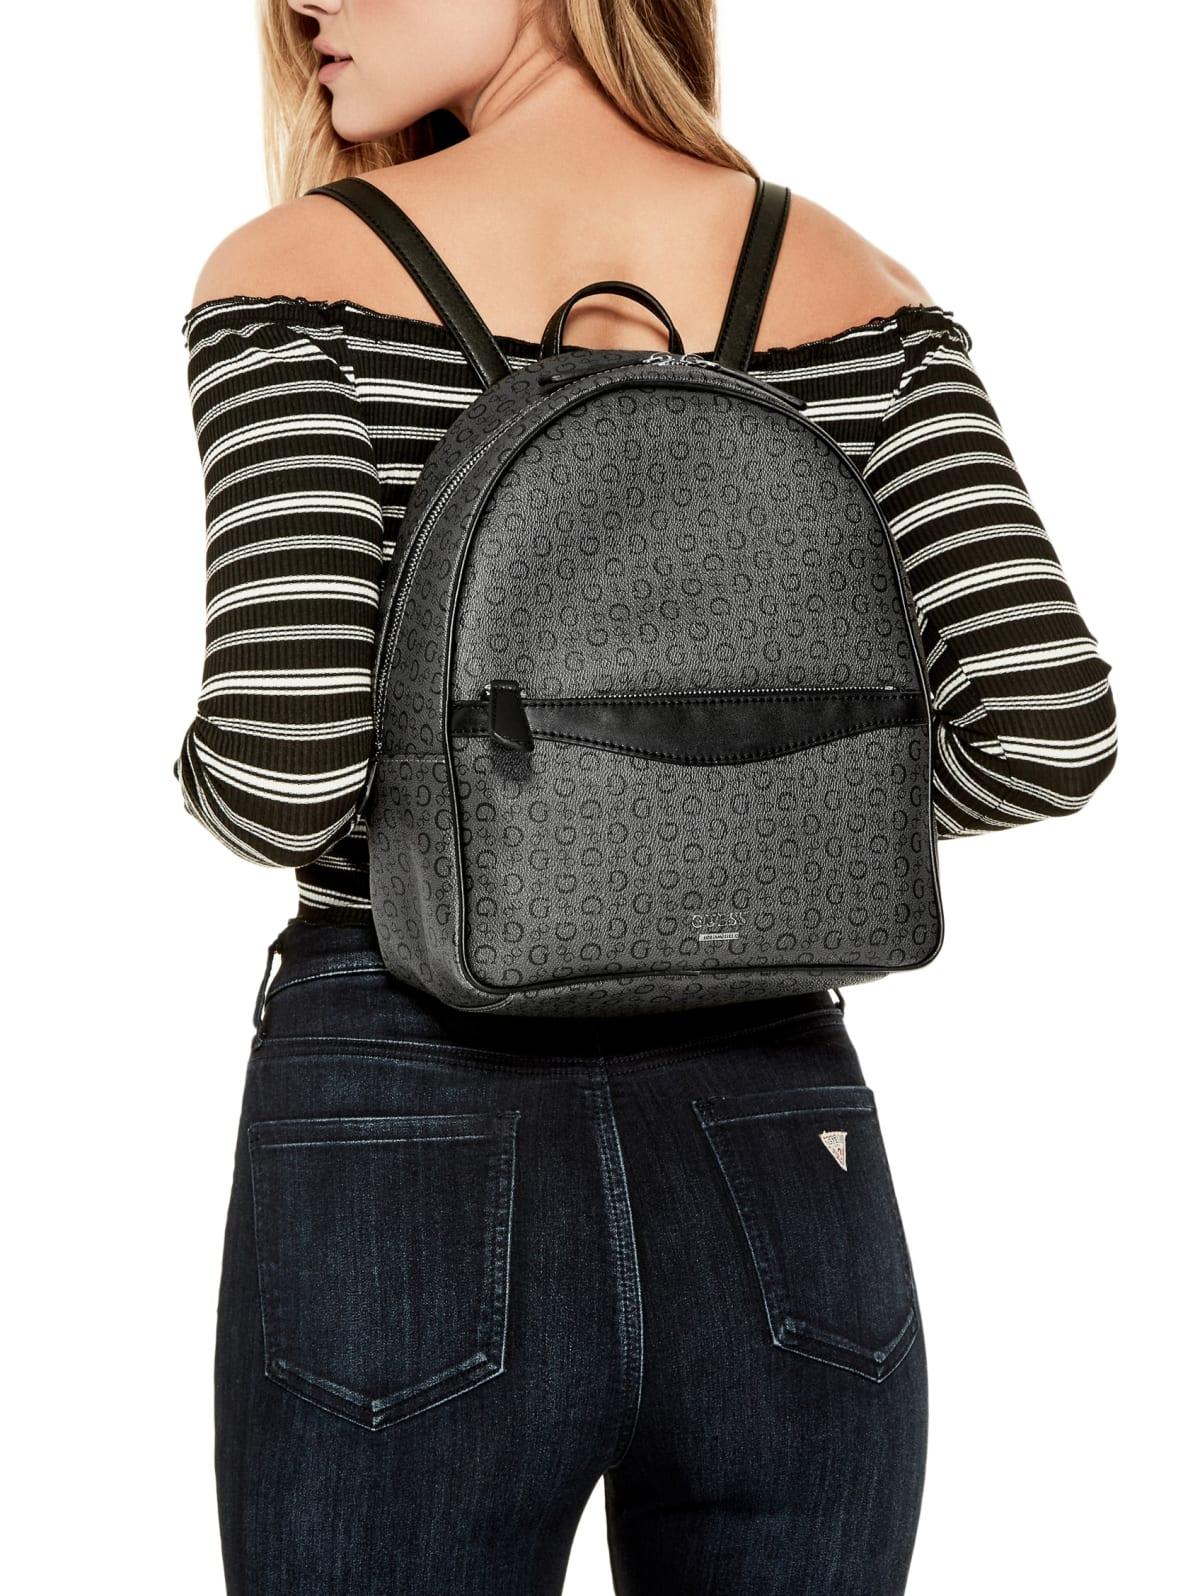 Details about GUESS Factory Women's Diem Logo Print Fashion Travel Shoulder Large Backpack